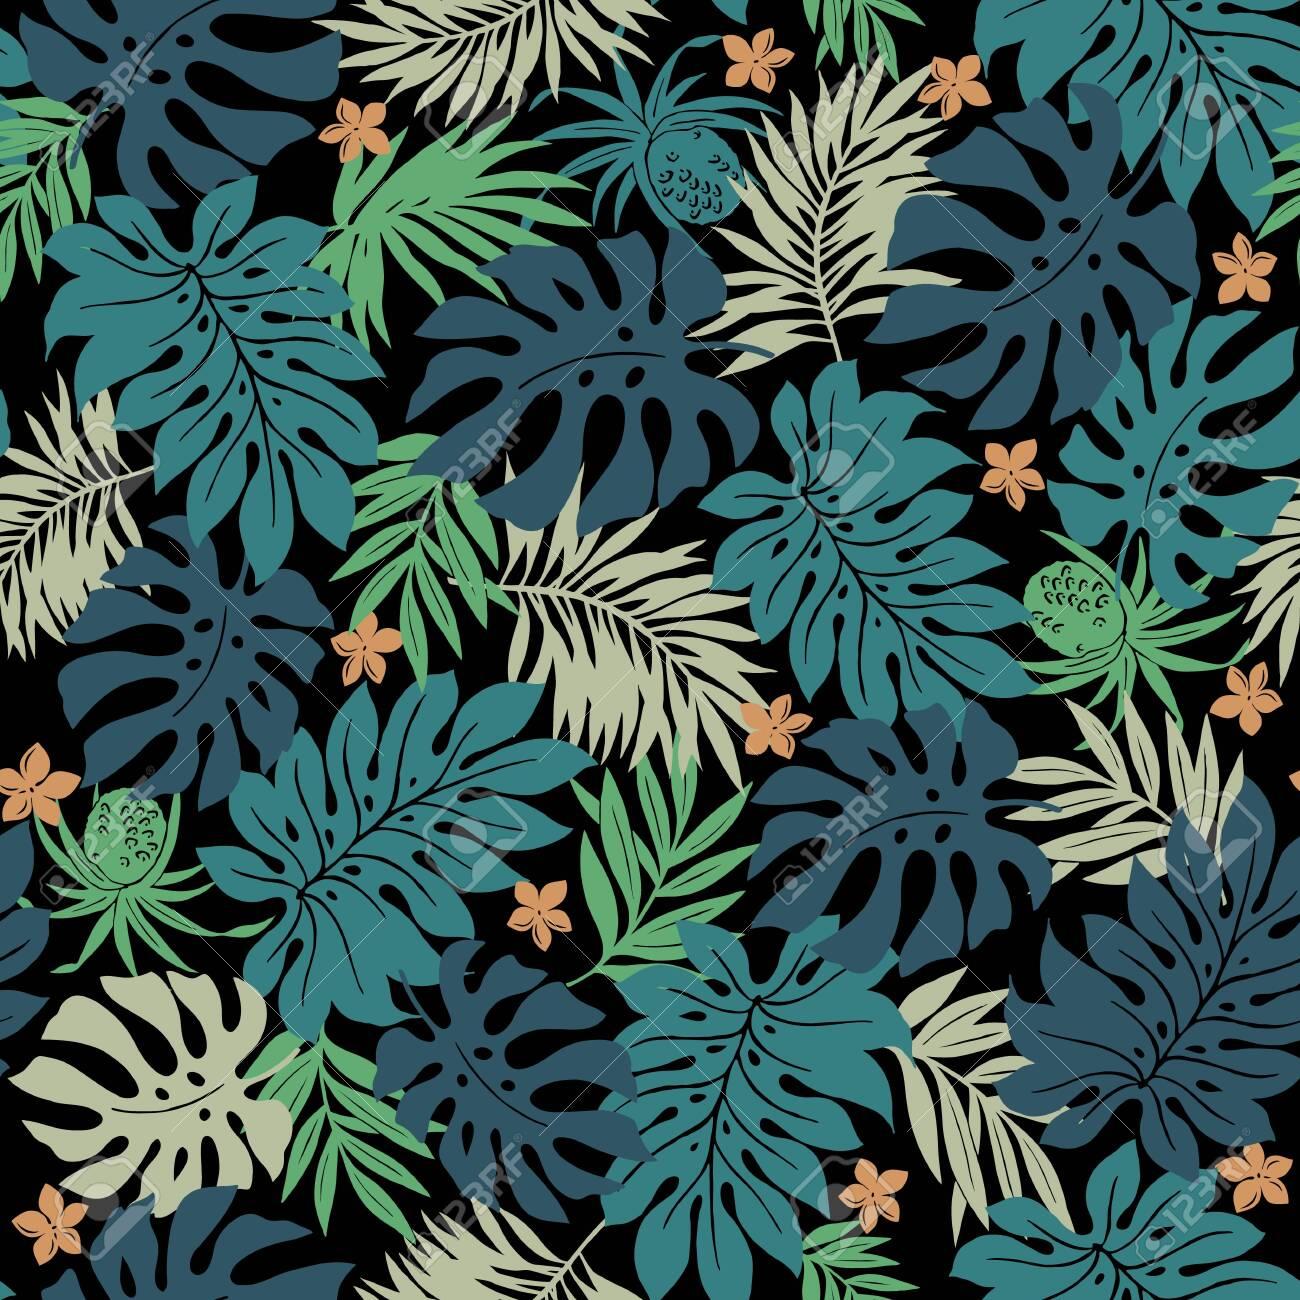 Beautiful Tropical Plant Seamless Pattern Illustration, - 142262457